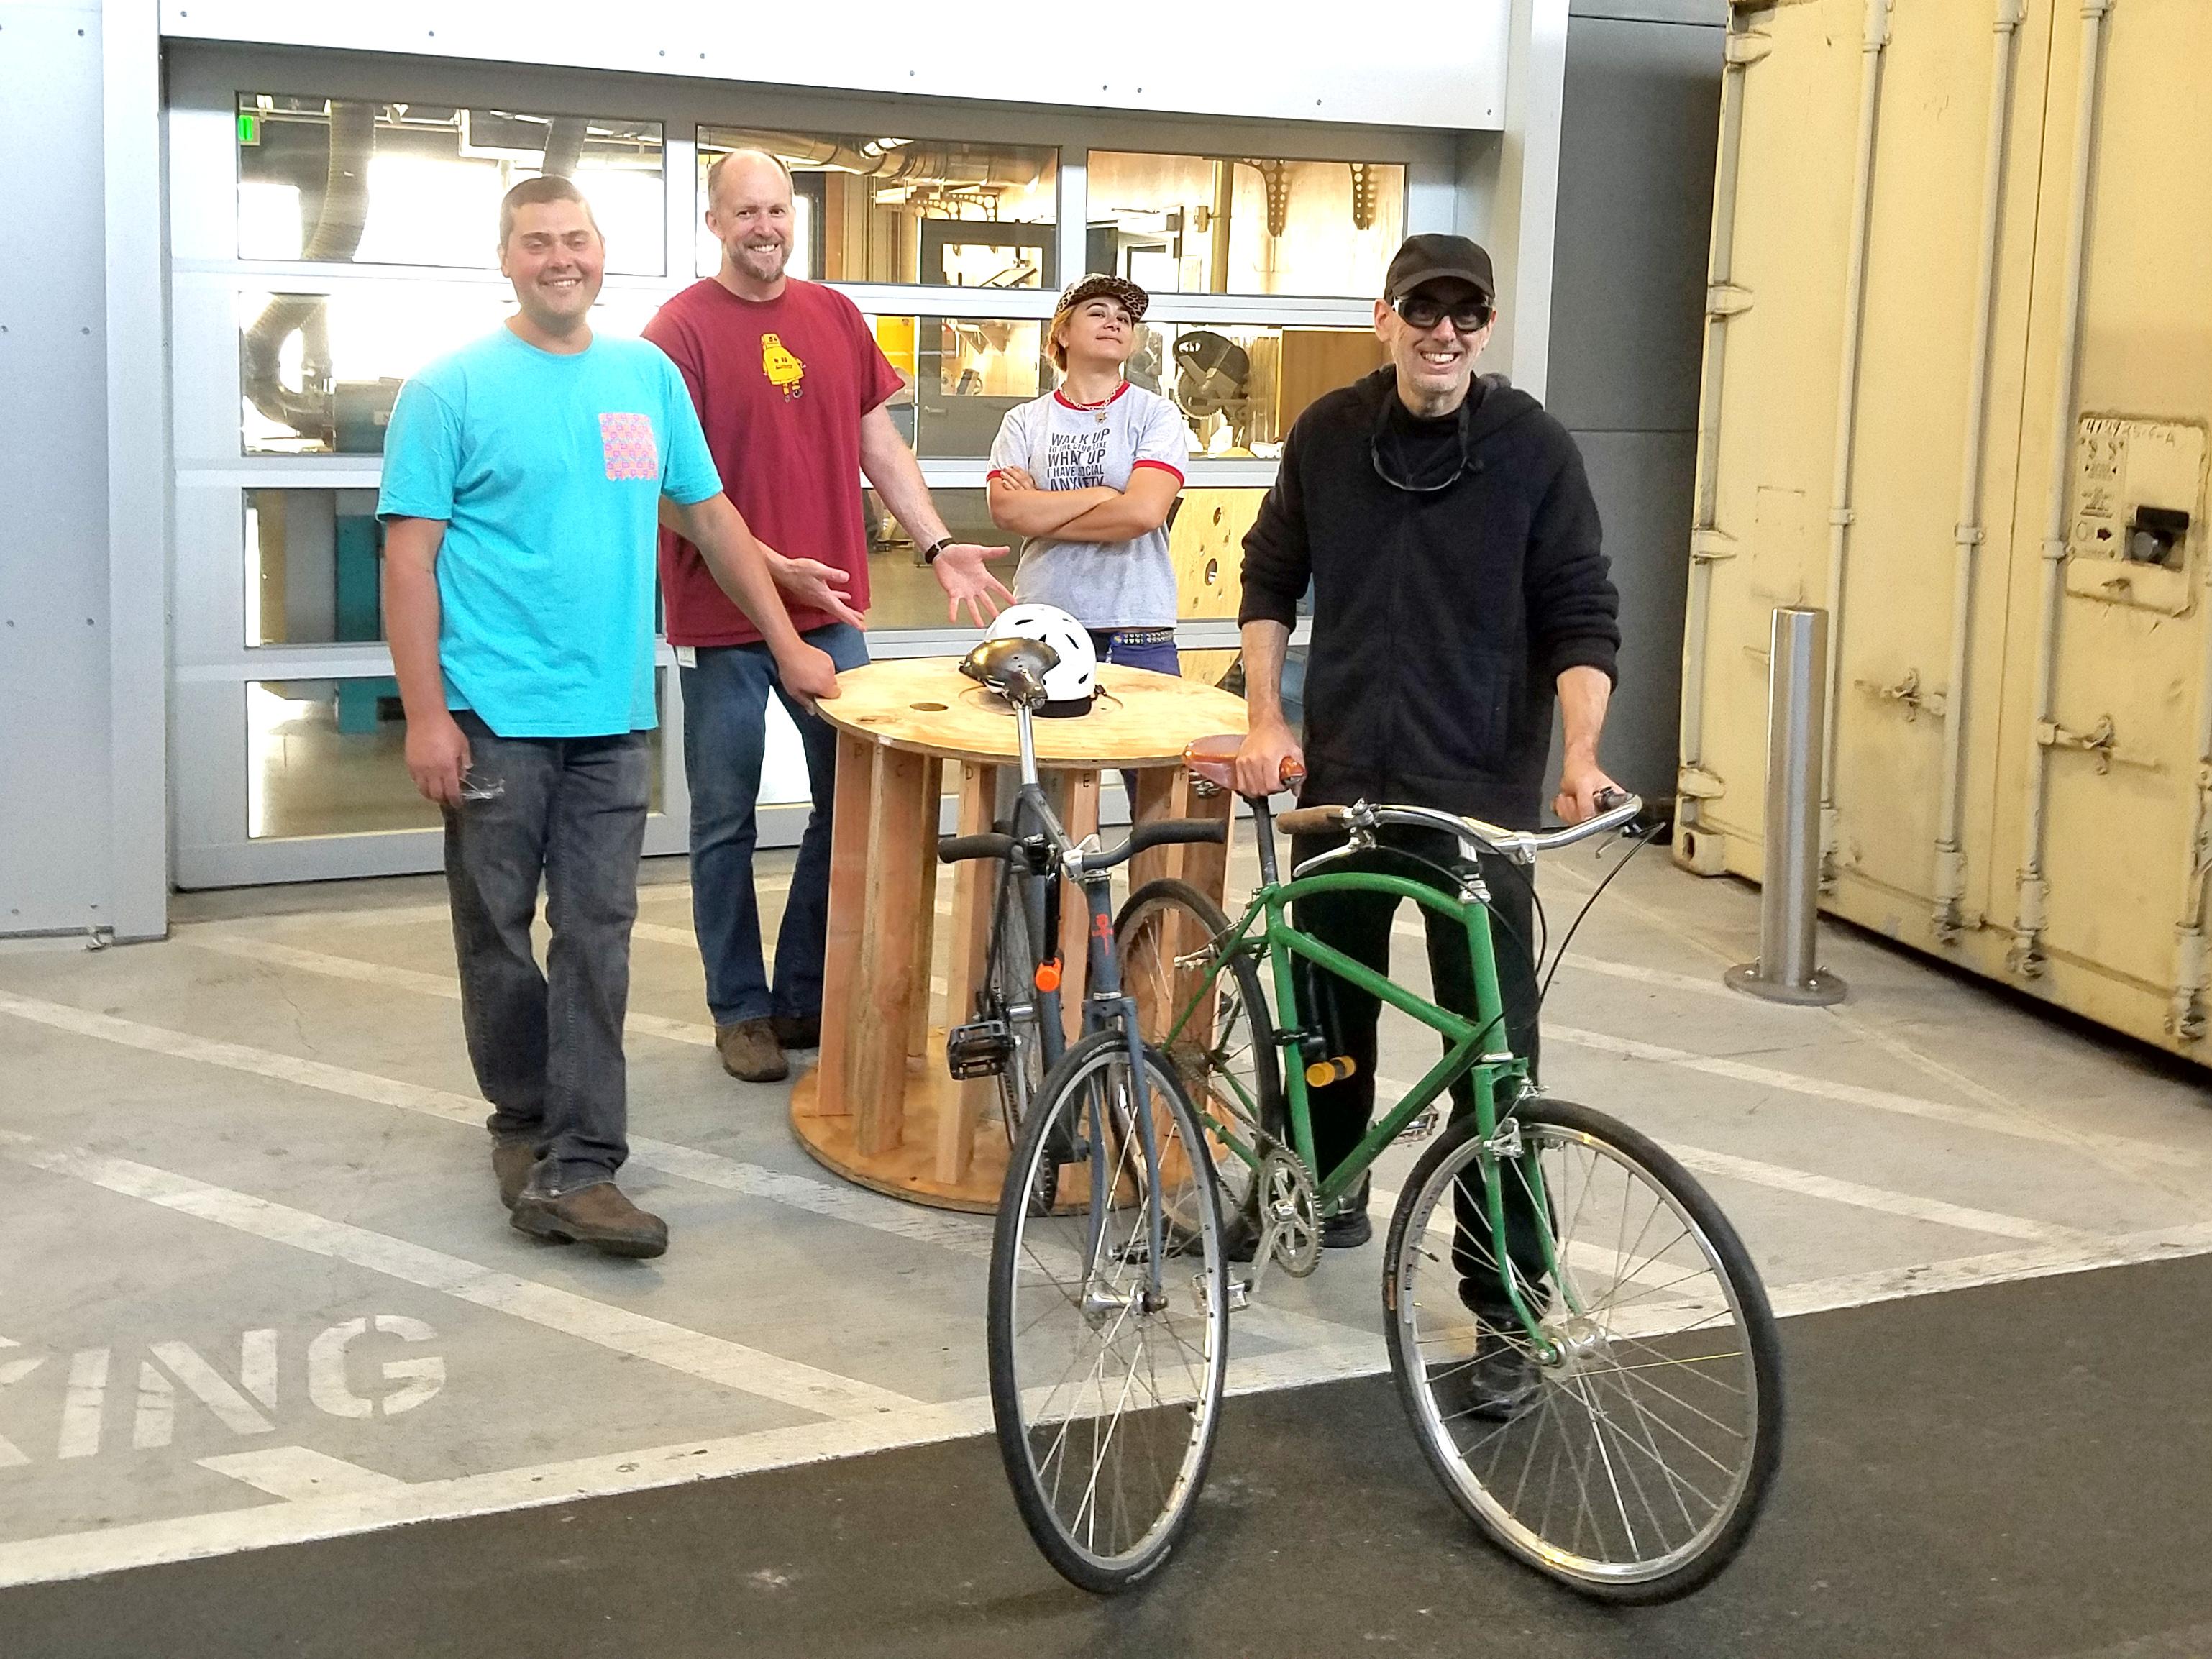 Picture of Circular Bike Rack for Burning Man